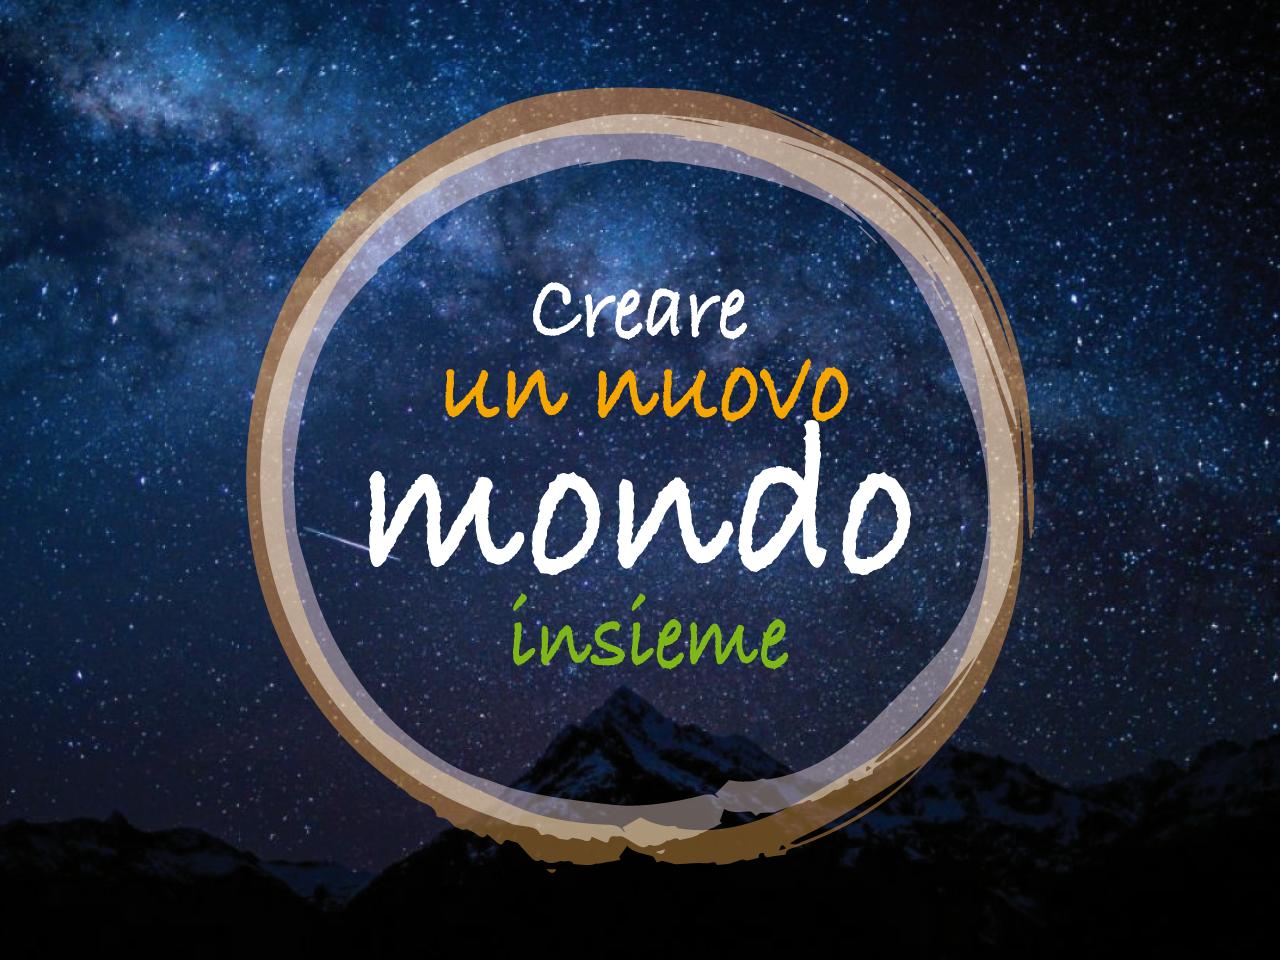 https://meditaedanza.com/wp-content/uploads/2020/12/evento-meditativo-online.png